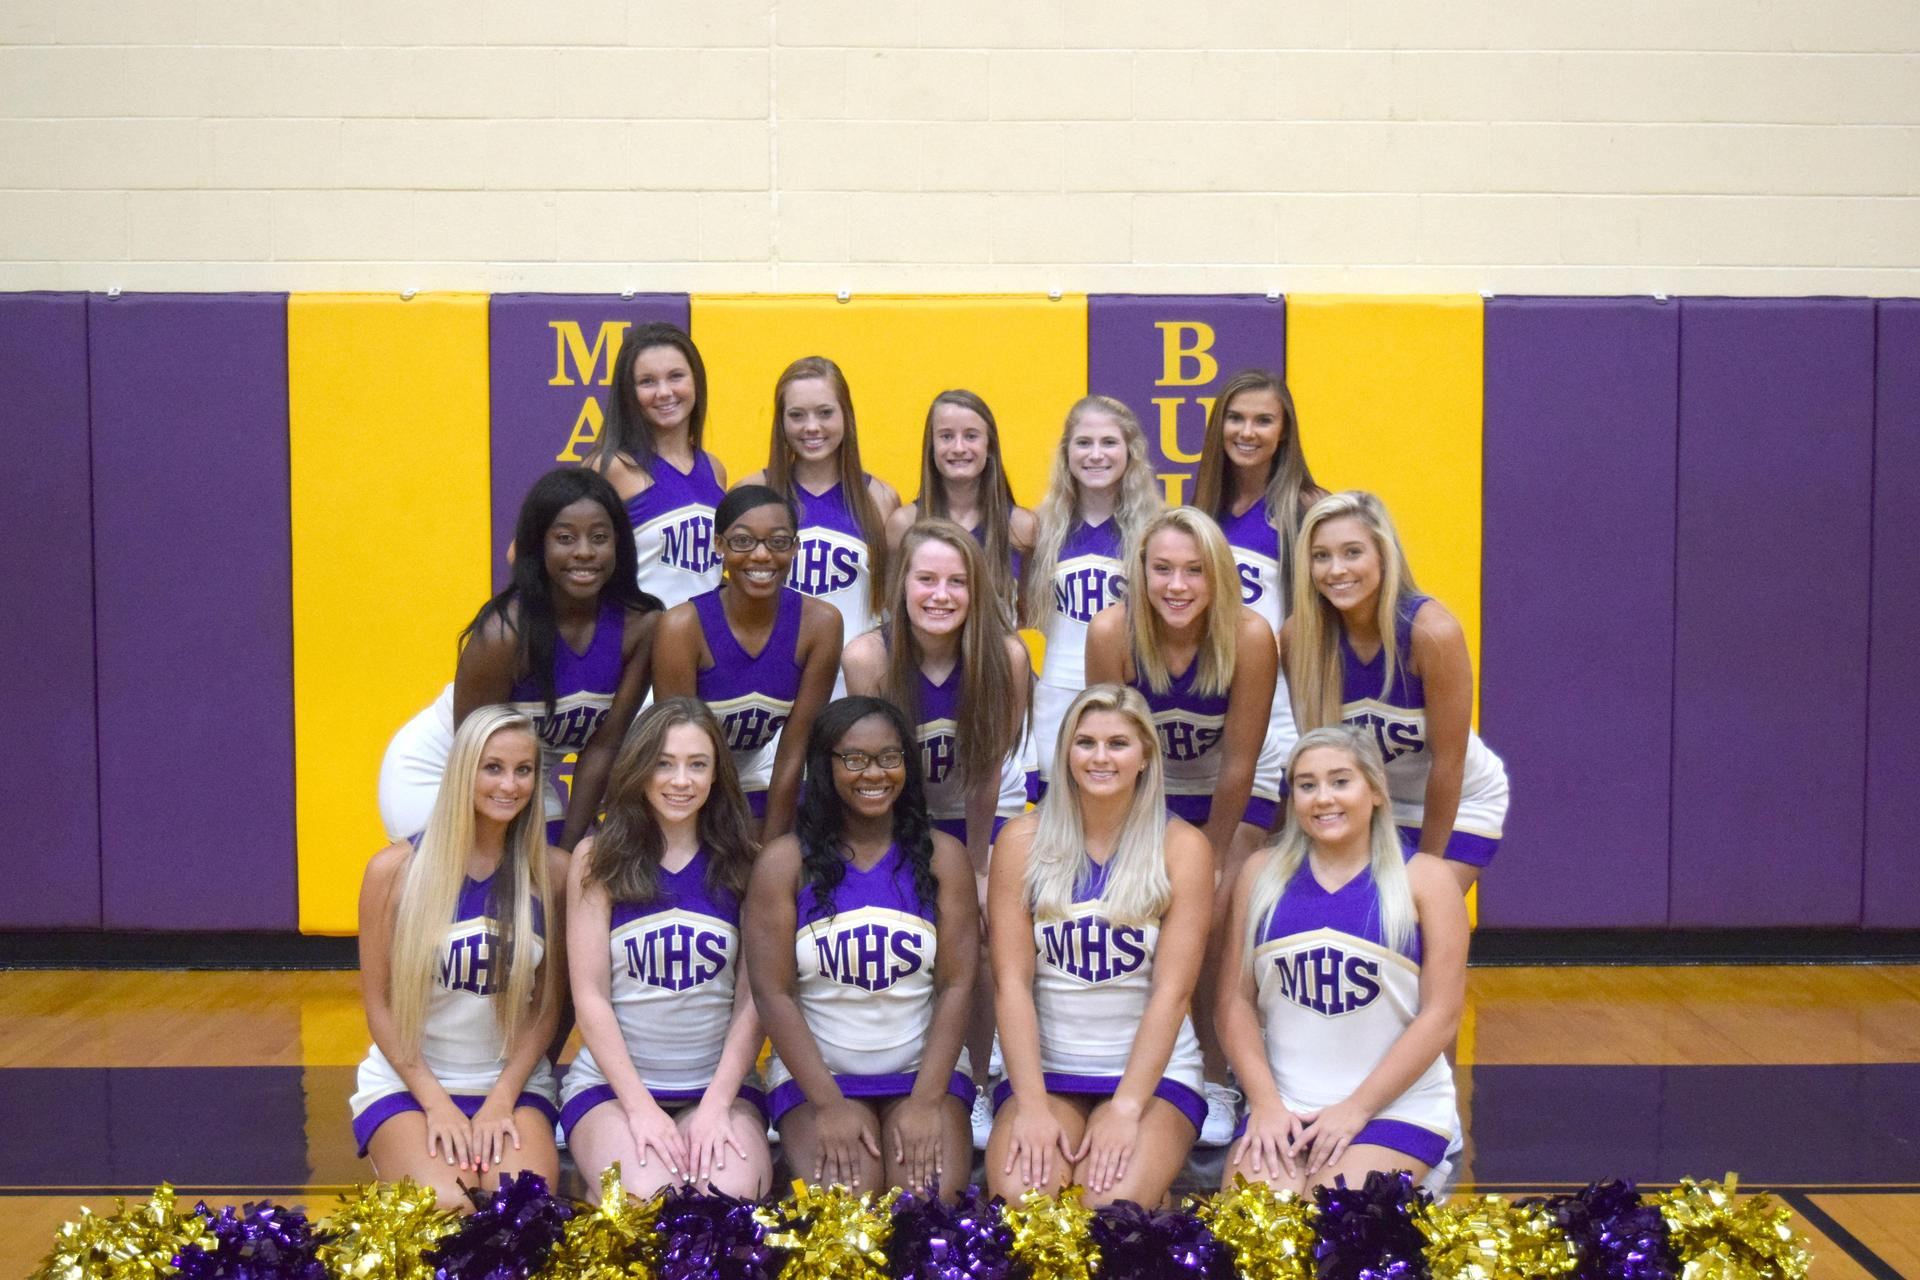 Marianna High School's Varsity Cheerleaders